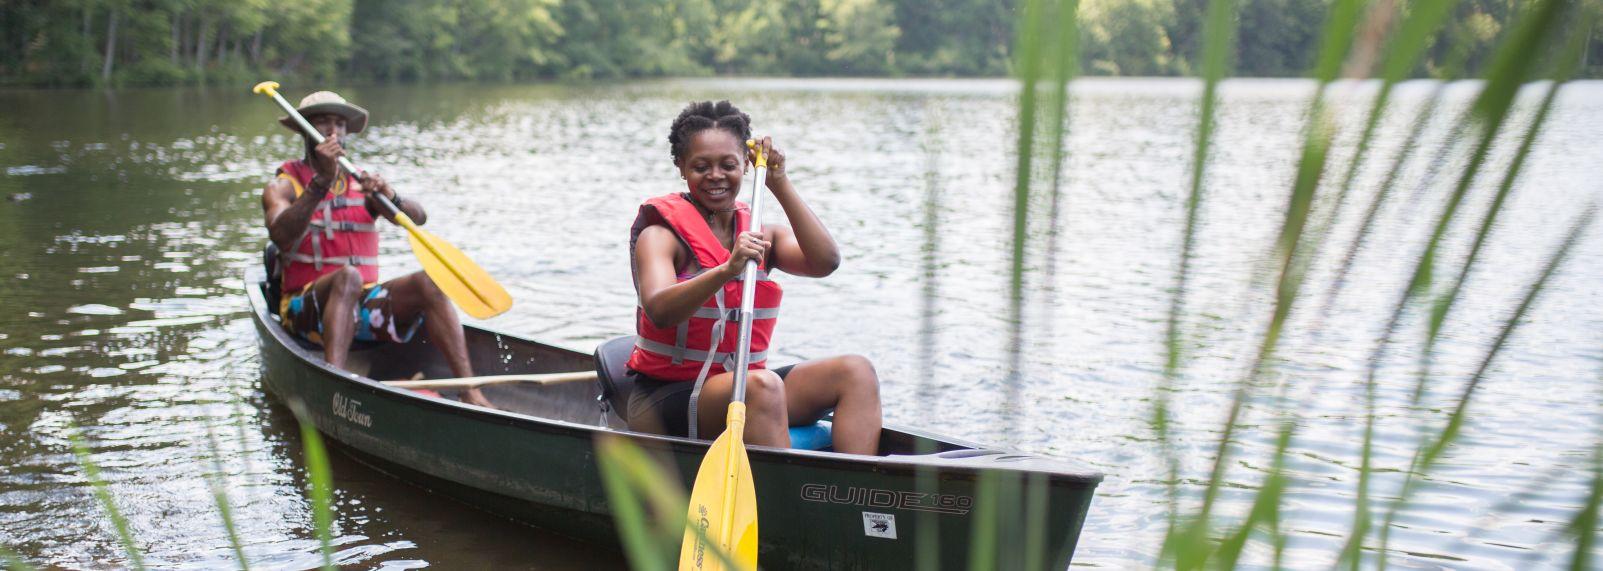 Umstead State Park Canoe Kayak Couple Date